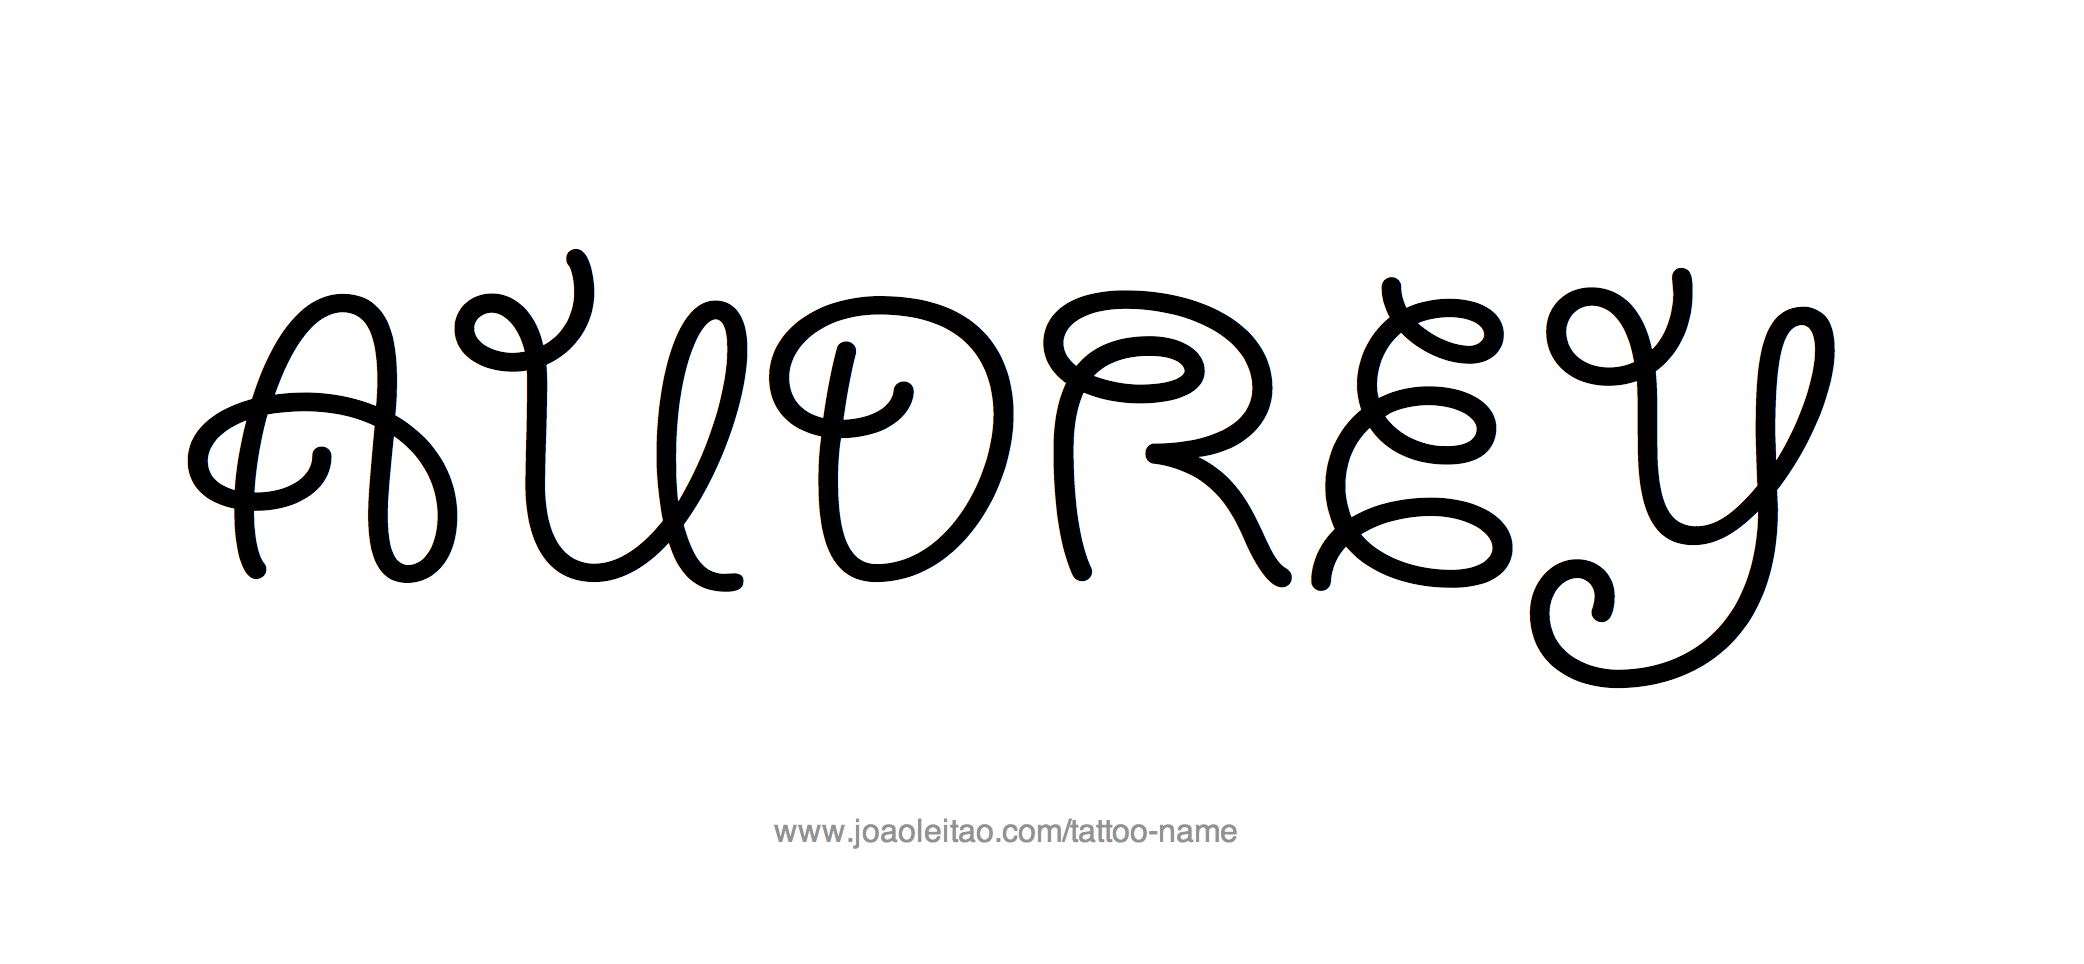 Pin Tattoo Fonts Style Fashion Club on Pinterest